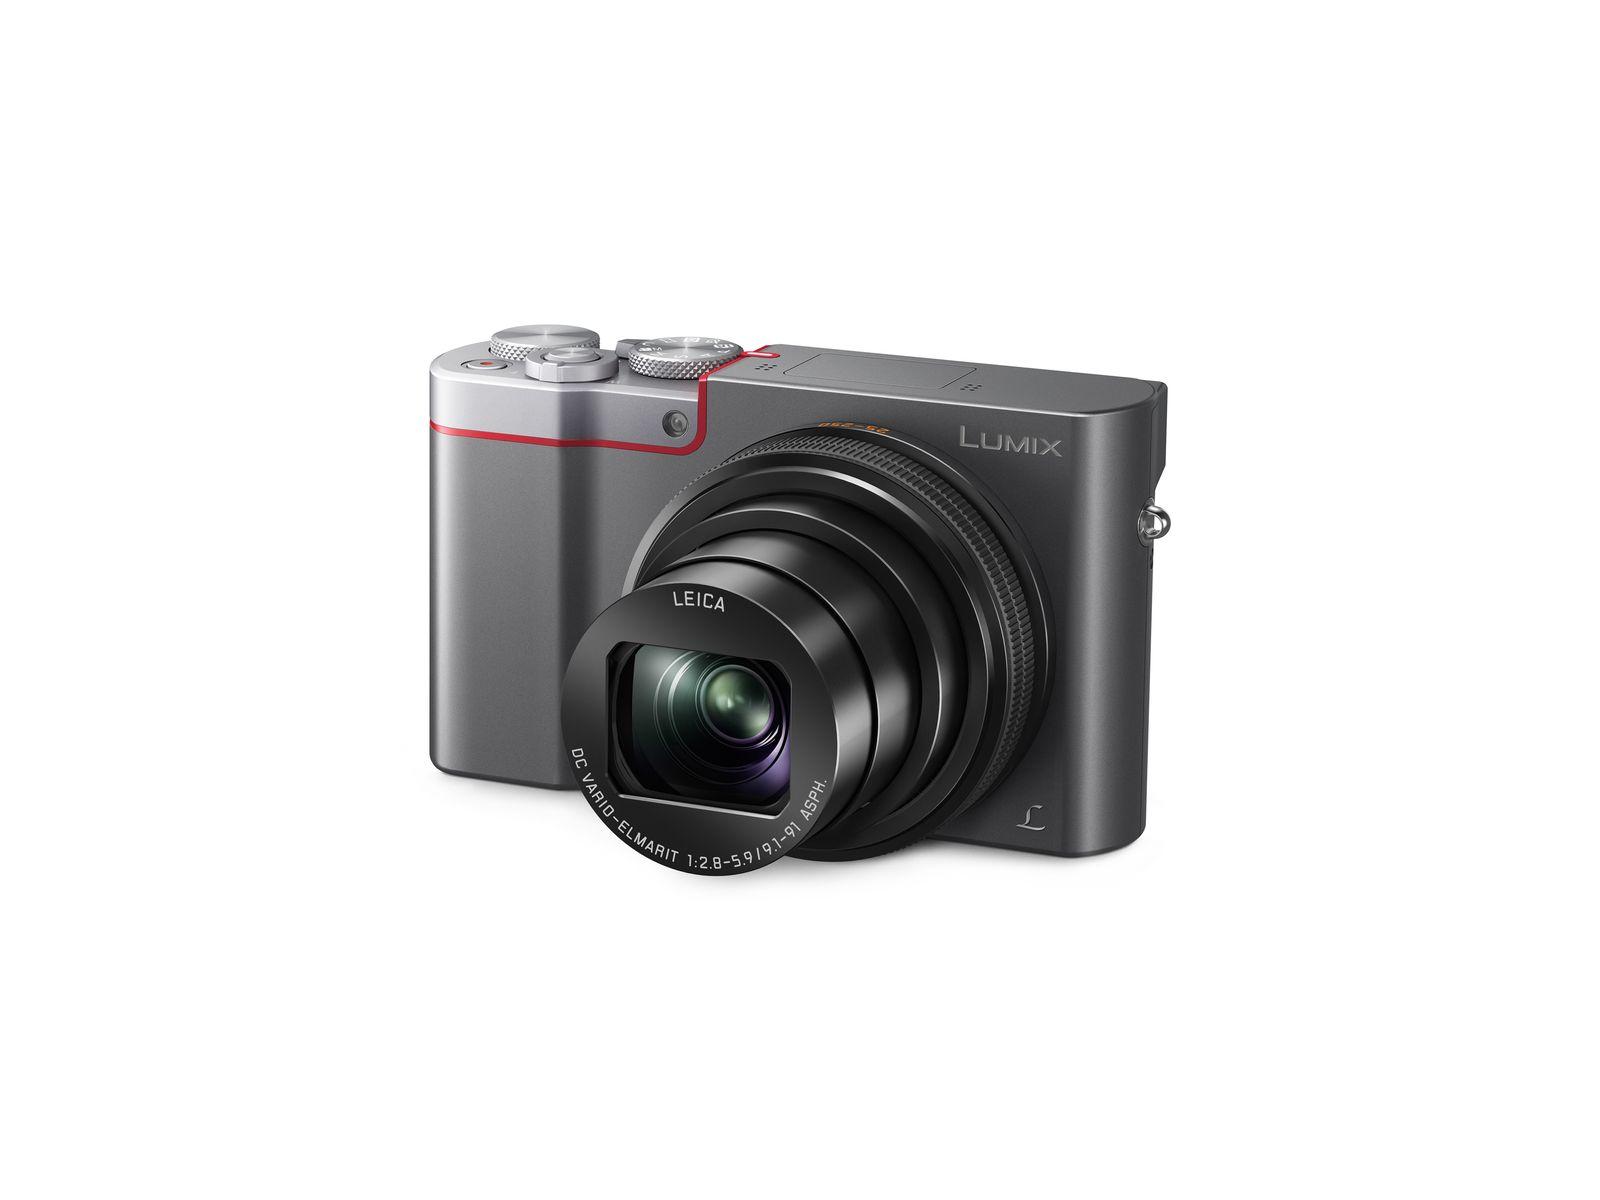 EINMALIGE VERWENDUNG Digicam-Features/ Post Focus Panasonic